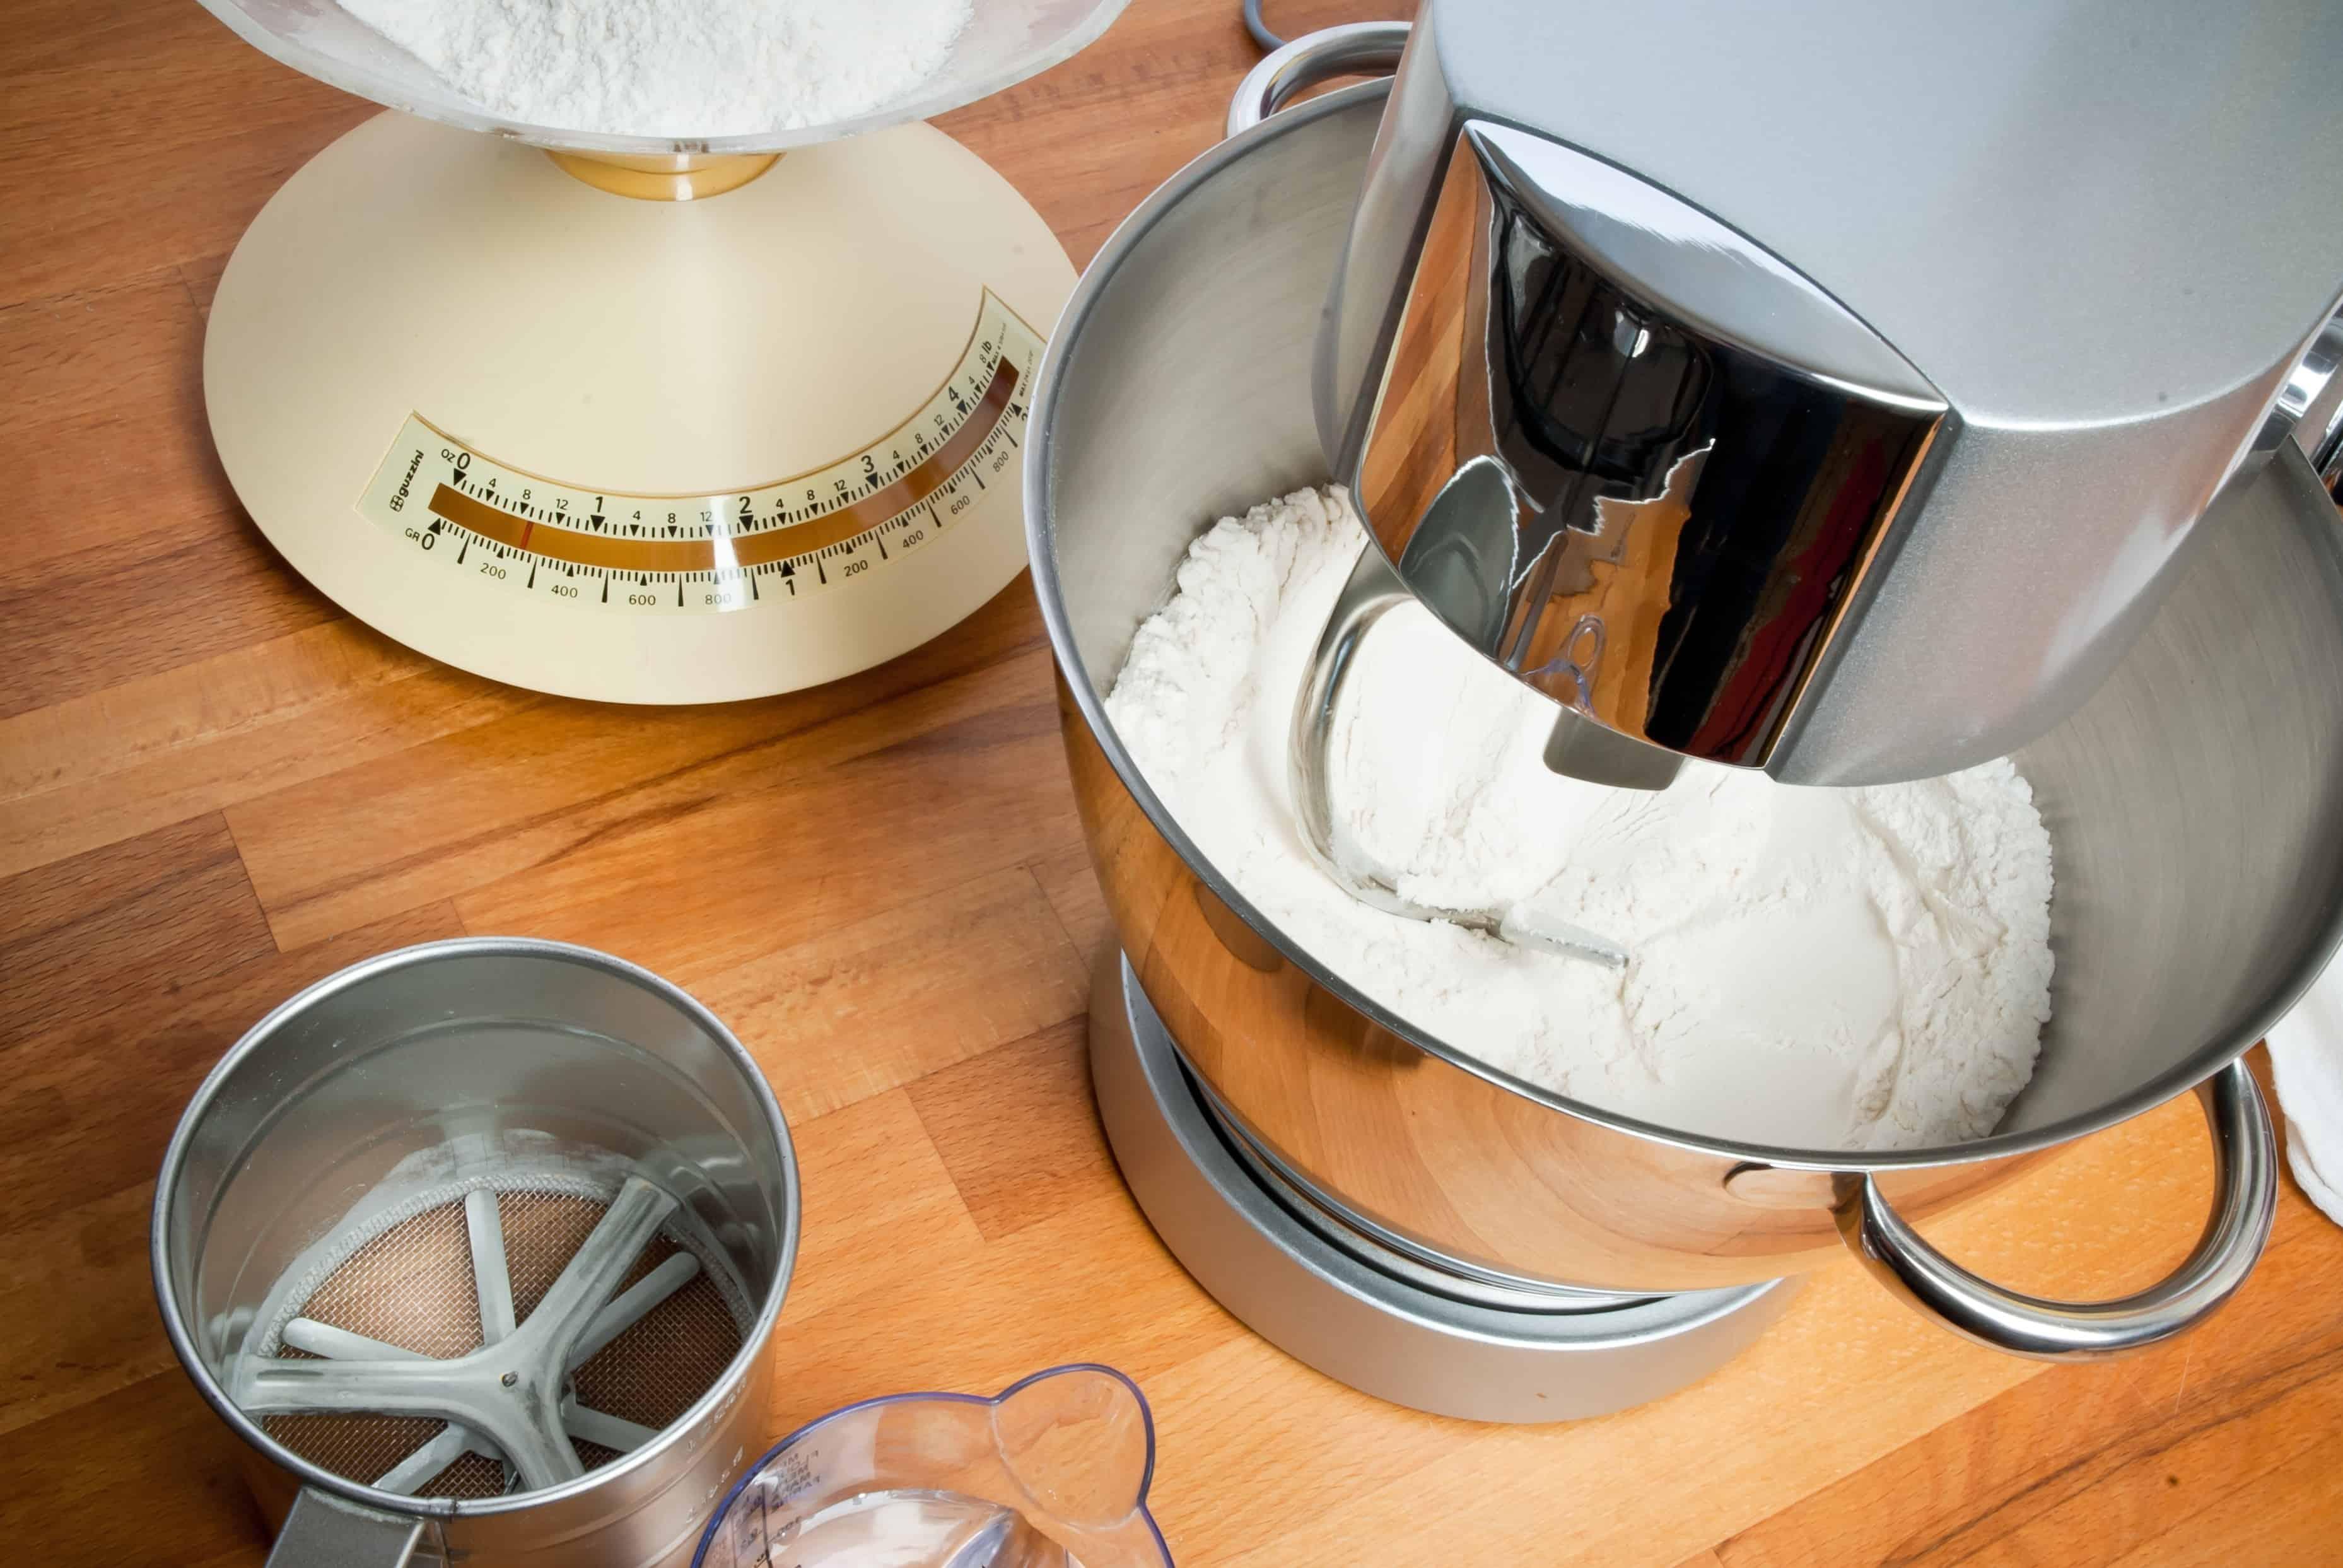 Un robot de cocina con otros accesorios para pastelería